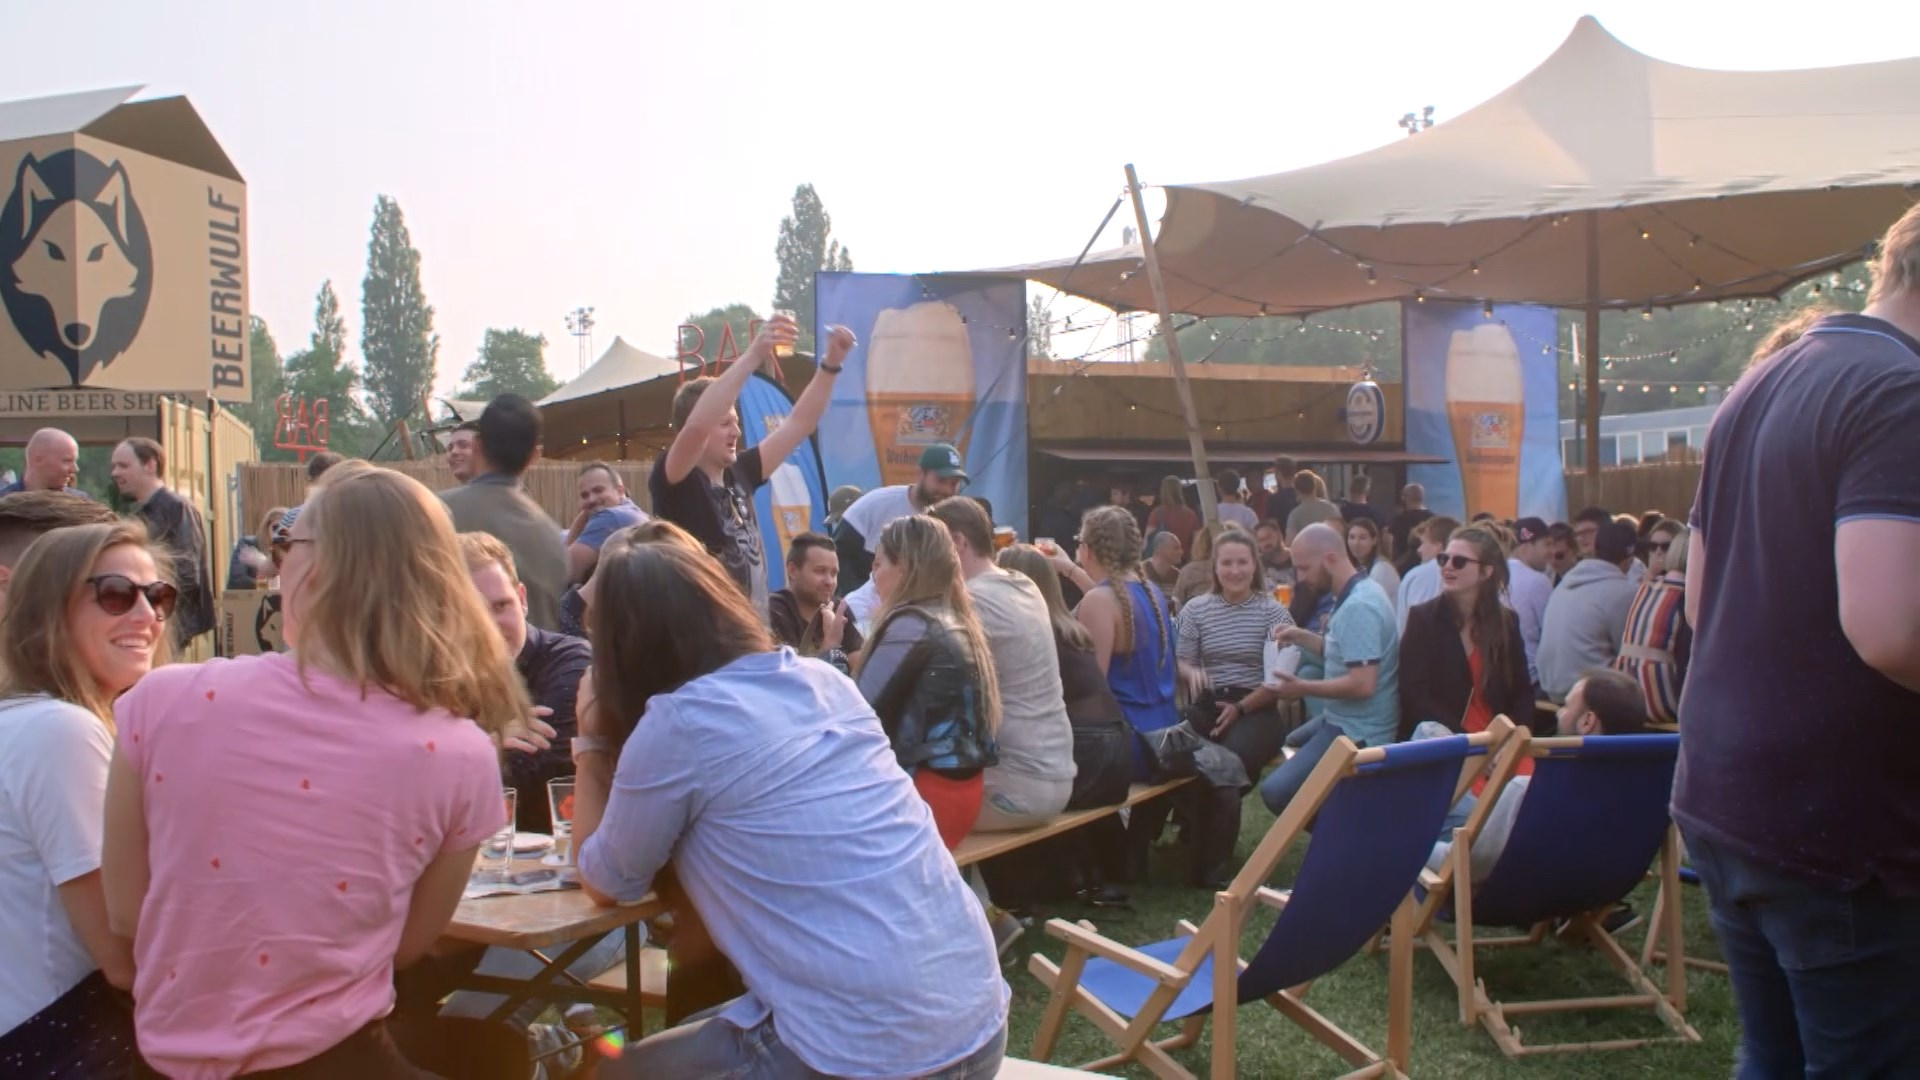 【天書】TAPT Festival (荷蘭啤酒節)